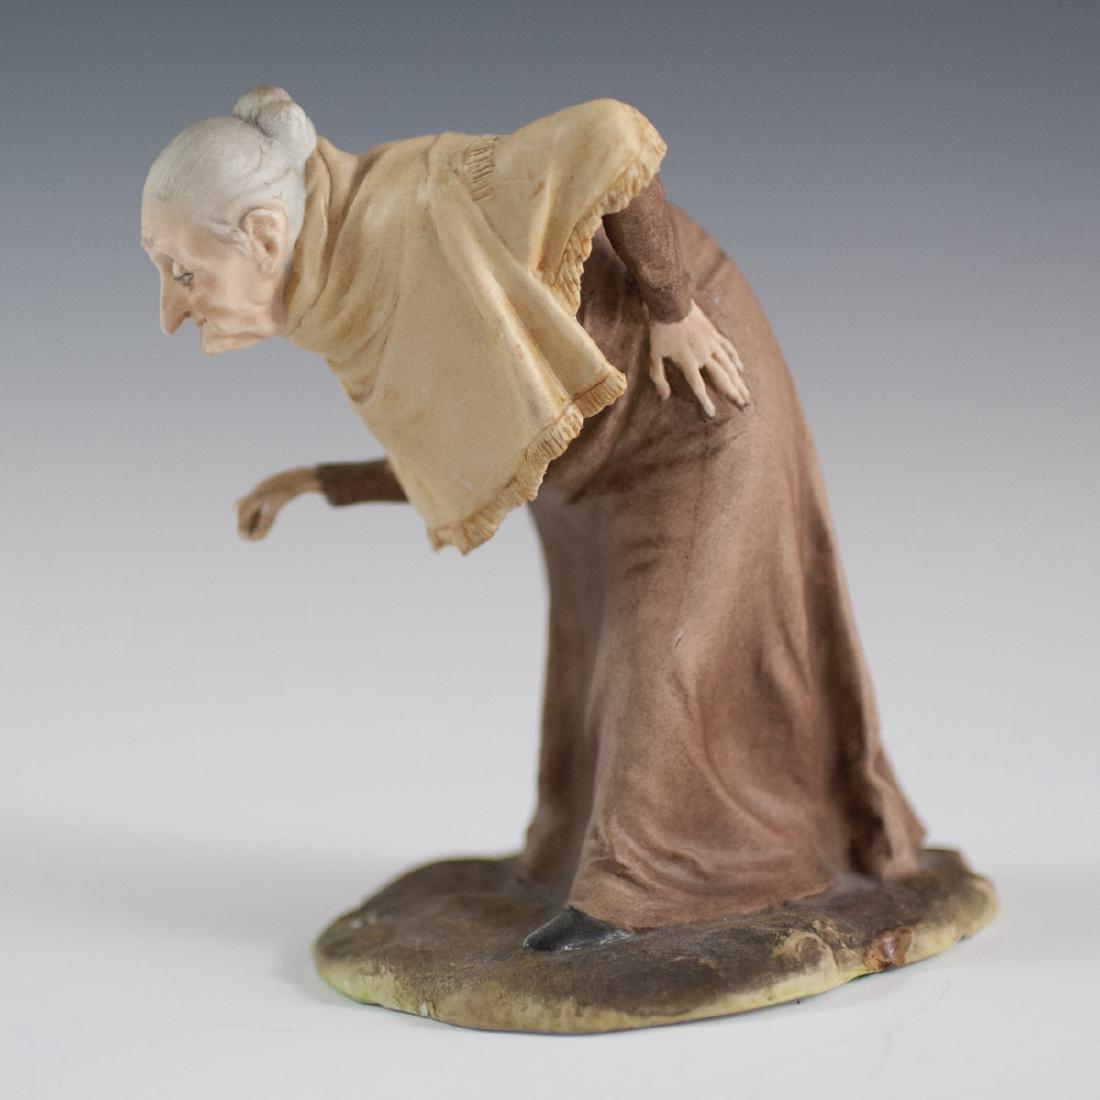 German Bisque Porcelain Figurine - 2